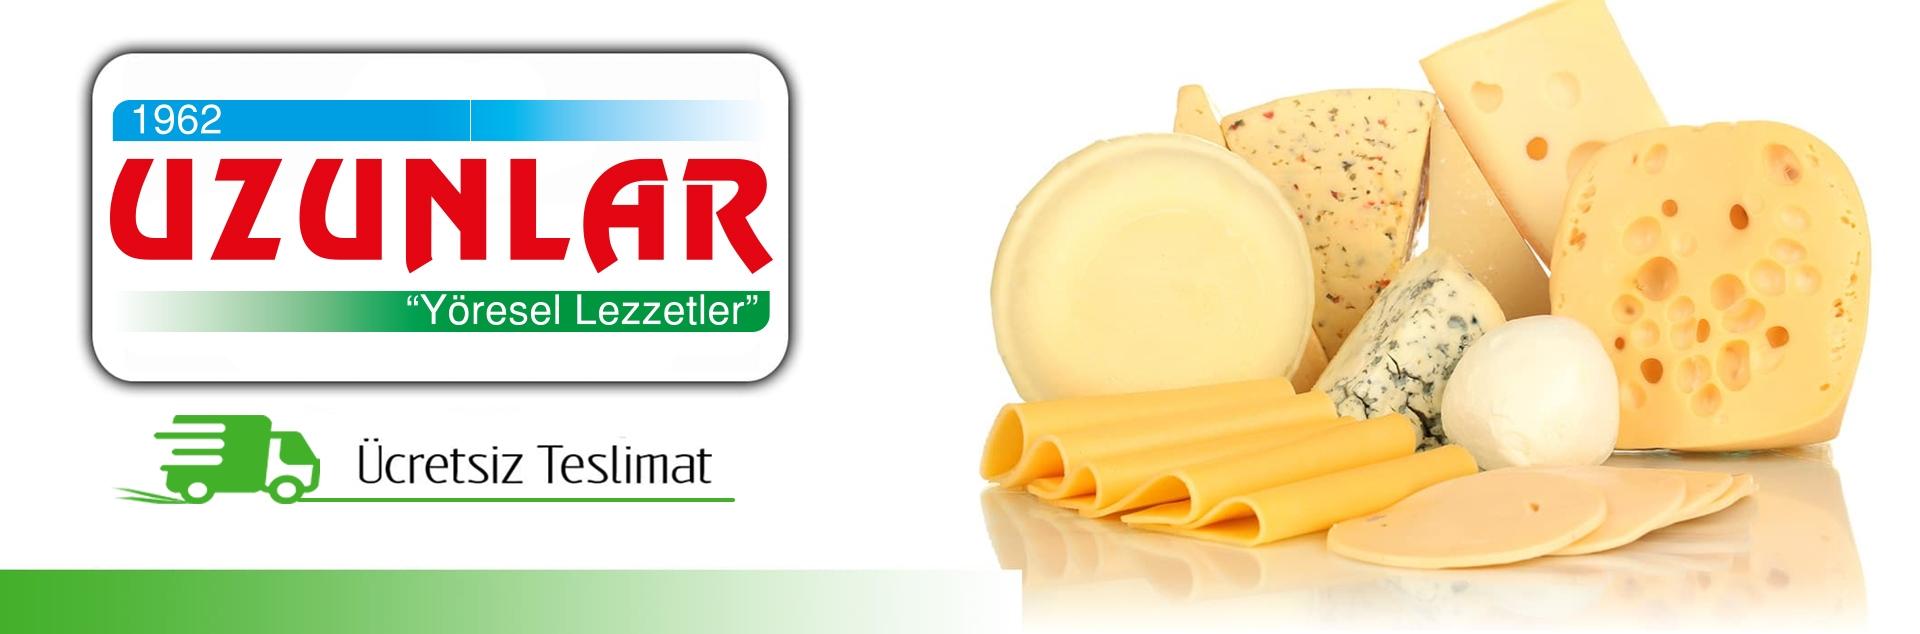 uzunlar peynir sanal peynirci online sipariş